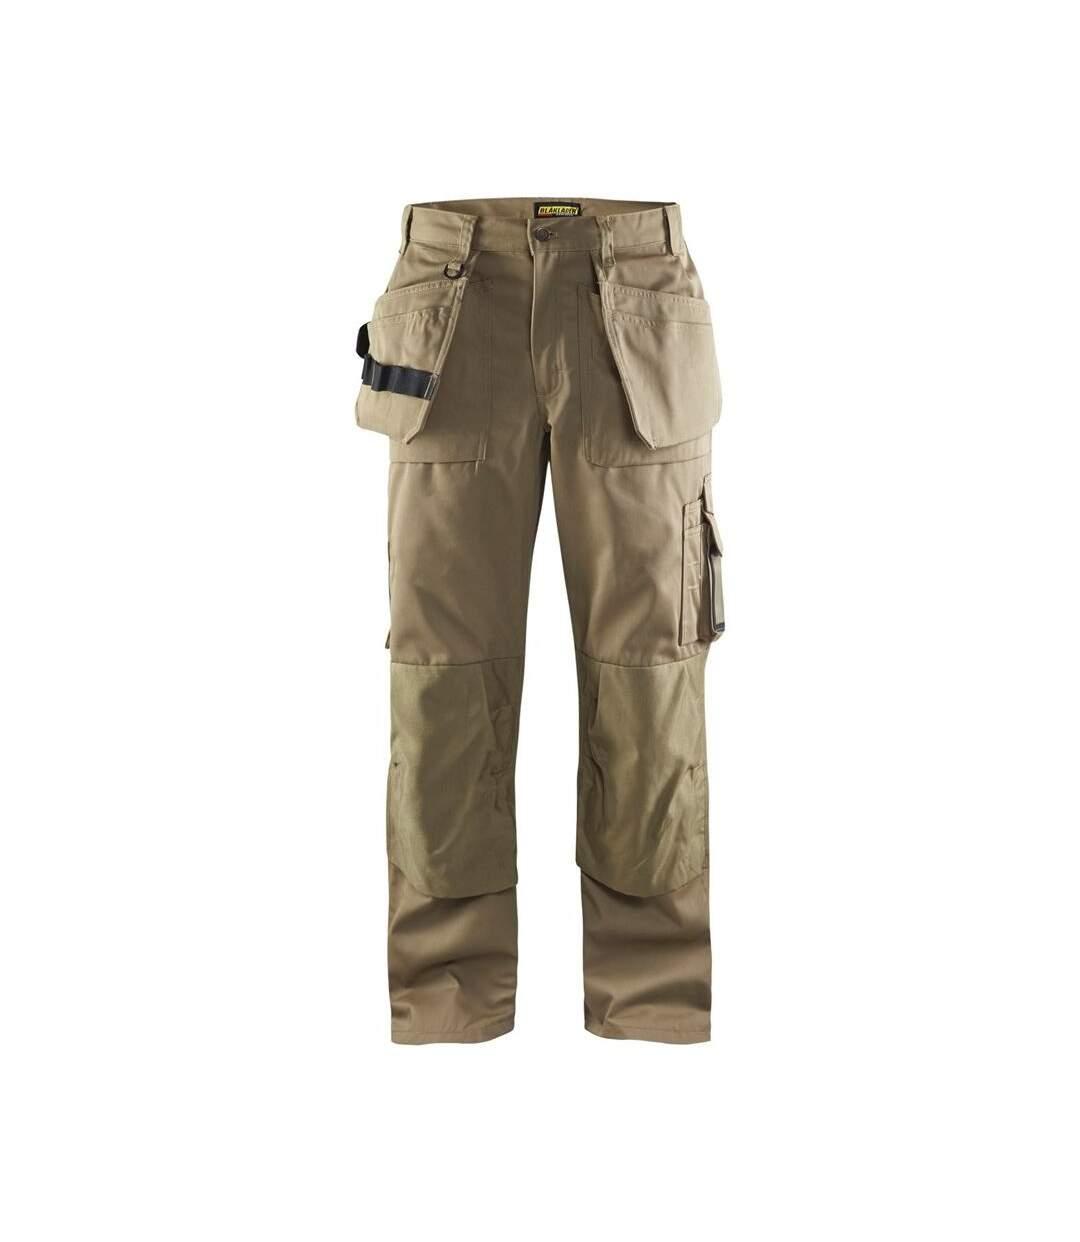 Pantalon  ARTISAN Blaklader Polycoton 300g